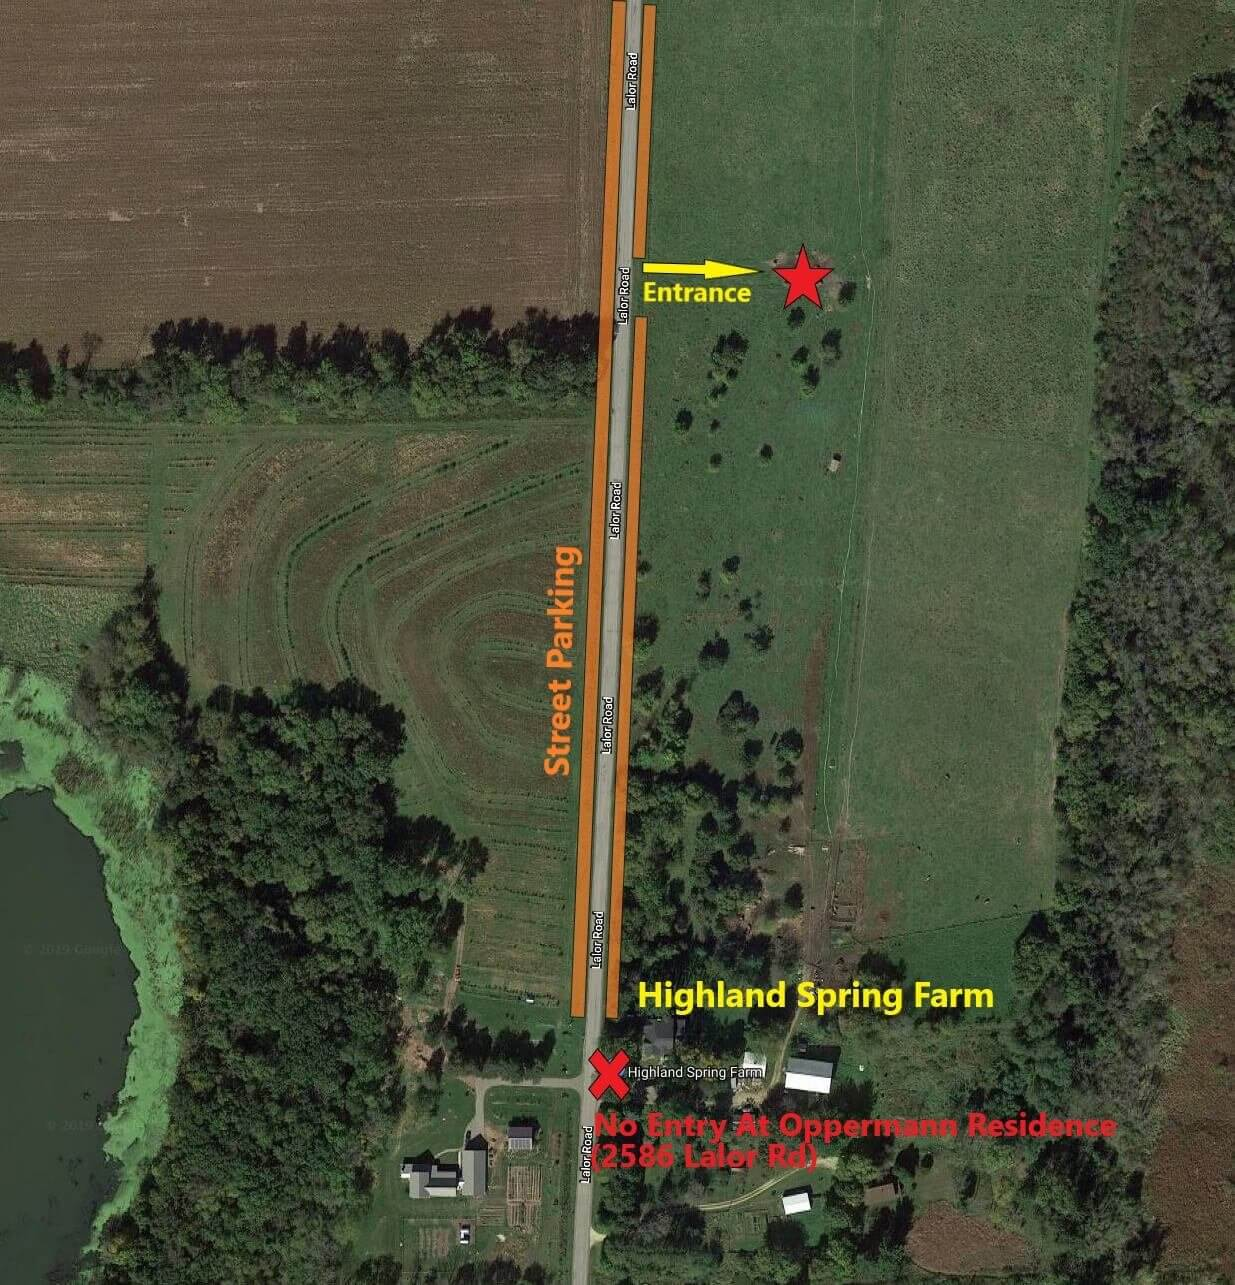 Meeting Location Map - Highland Spring Farm